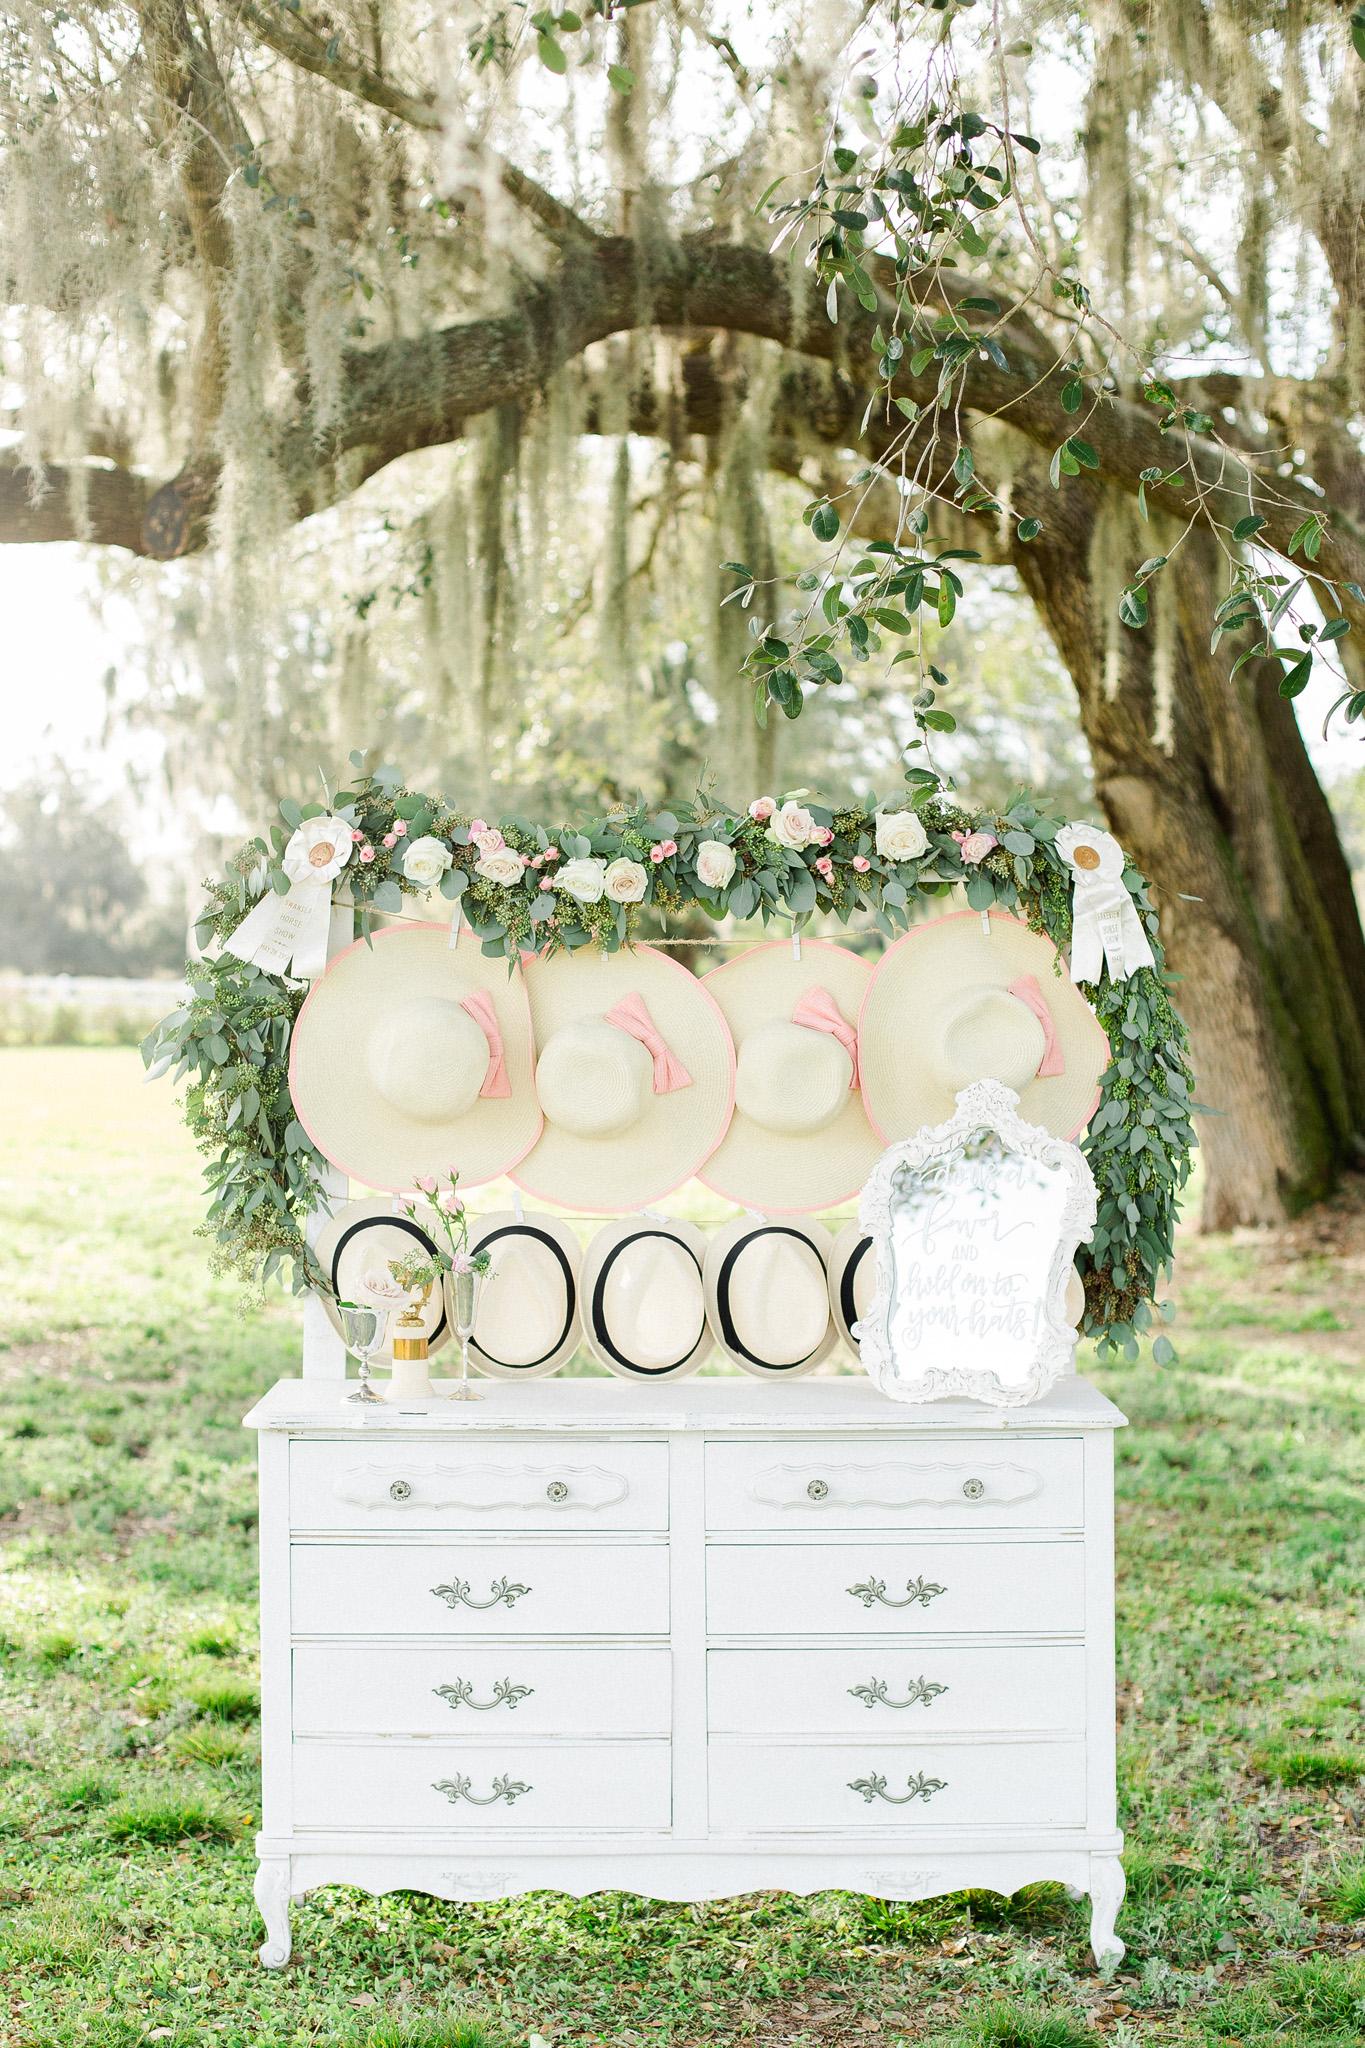 Lakeland Weddings and Events Designer